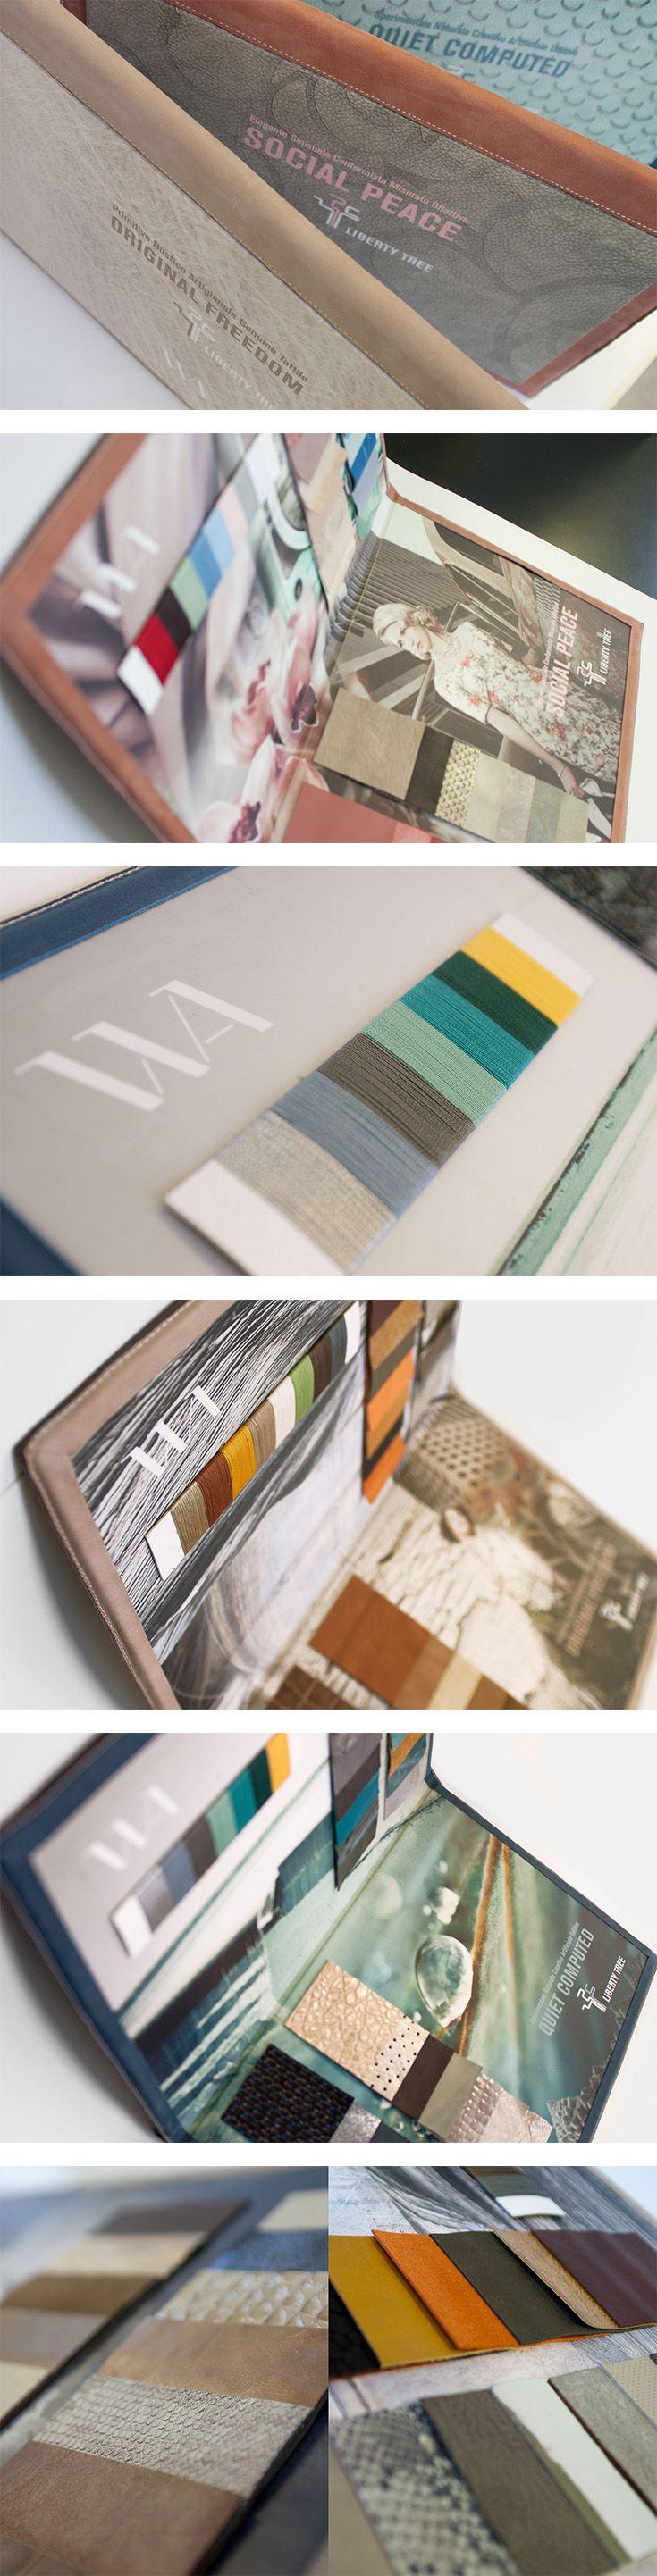 Packaging per Weare, un progetto #effADV - Weare packaging, effADV project - #packaging #book #colors #fabrics #samples